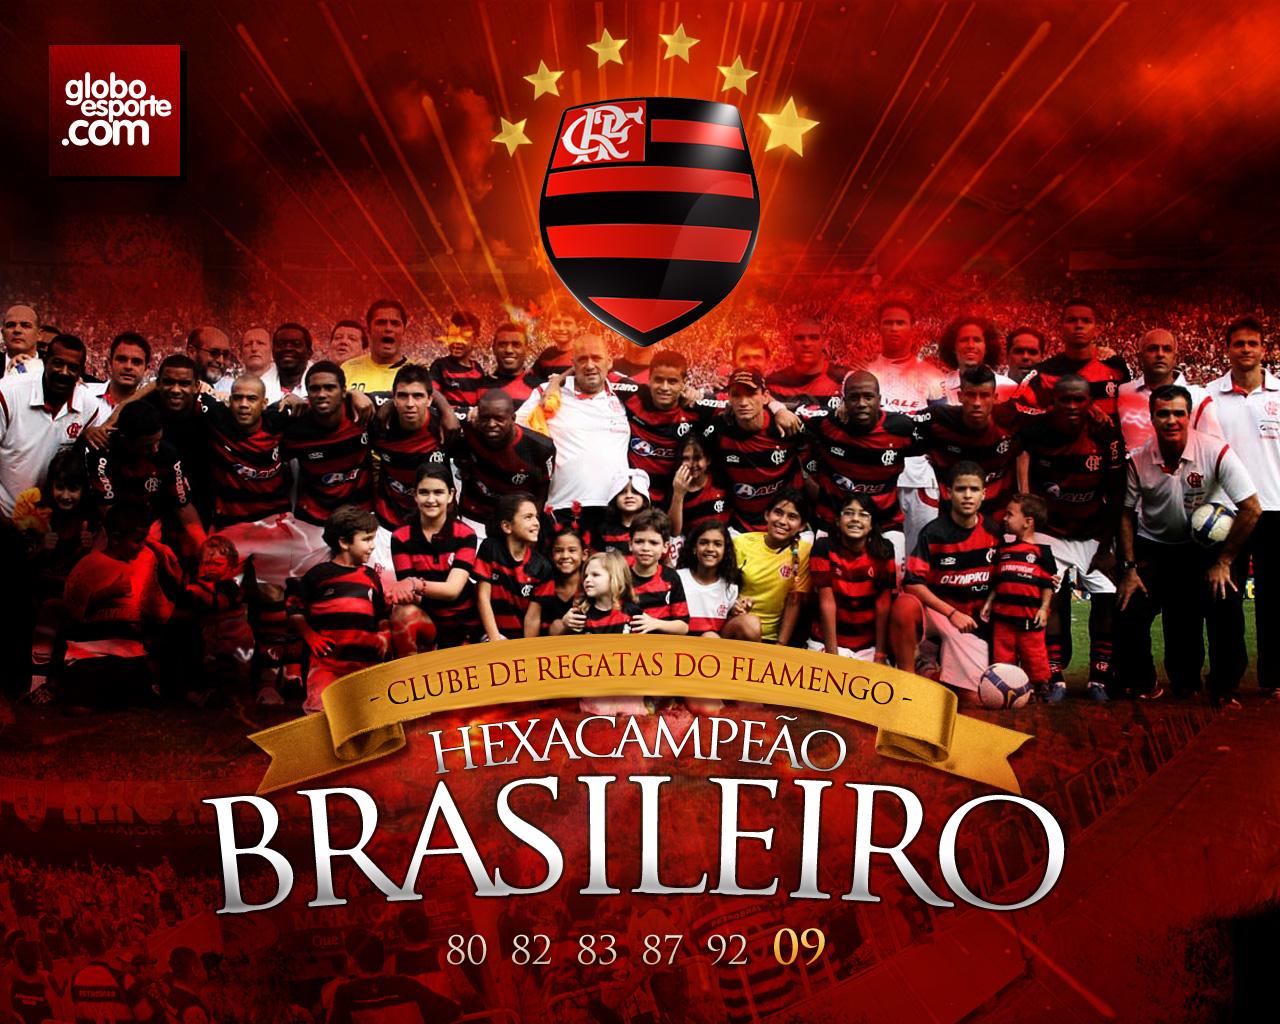 http://1.bp.blogspot.com/-65i9p4NoY-8/UOYa2h_tZAI/AAAAAAABGM4/4s9cuPq3bYs/s1600/wallpaper-+Flamengo+-wallpaper+(26).jpg